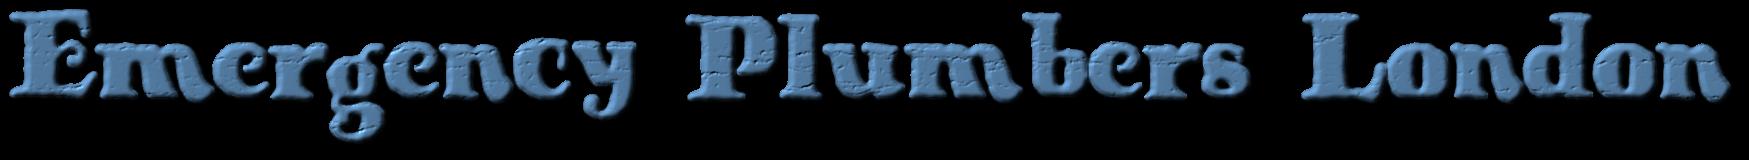 Find Emergency Plumbers London on Buffer http://buff.ly/2fiCiLu #London #Plumbing